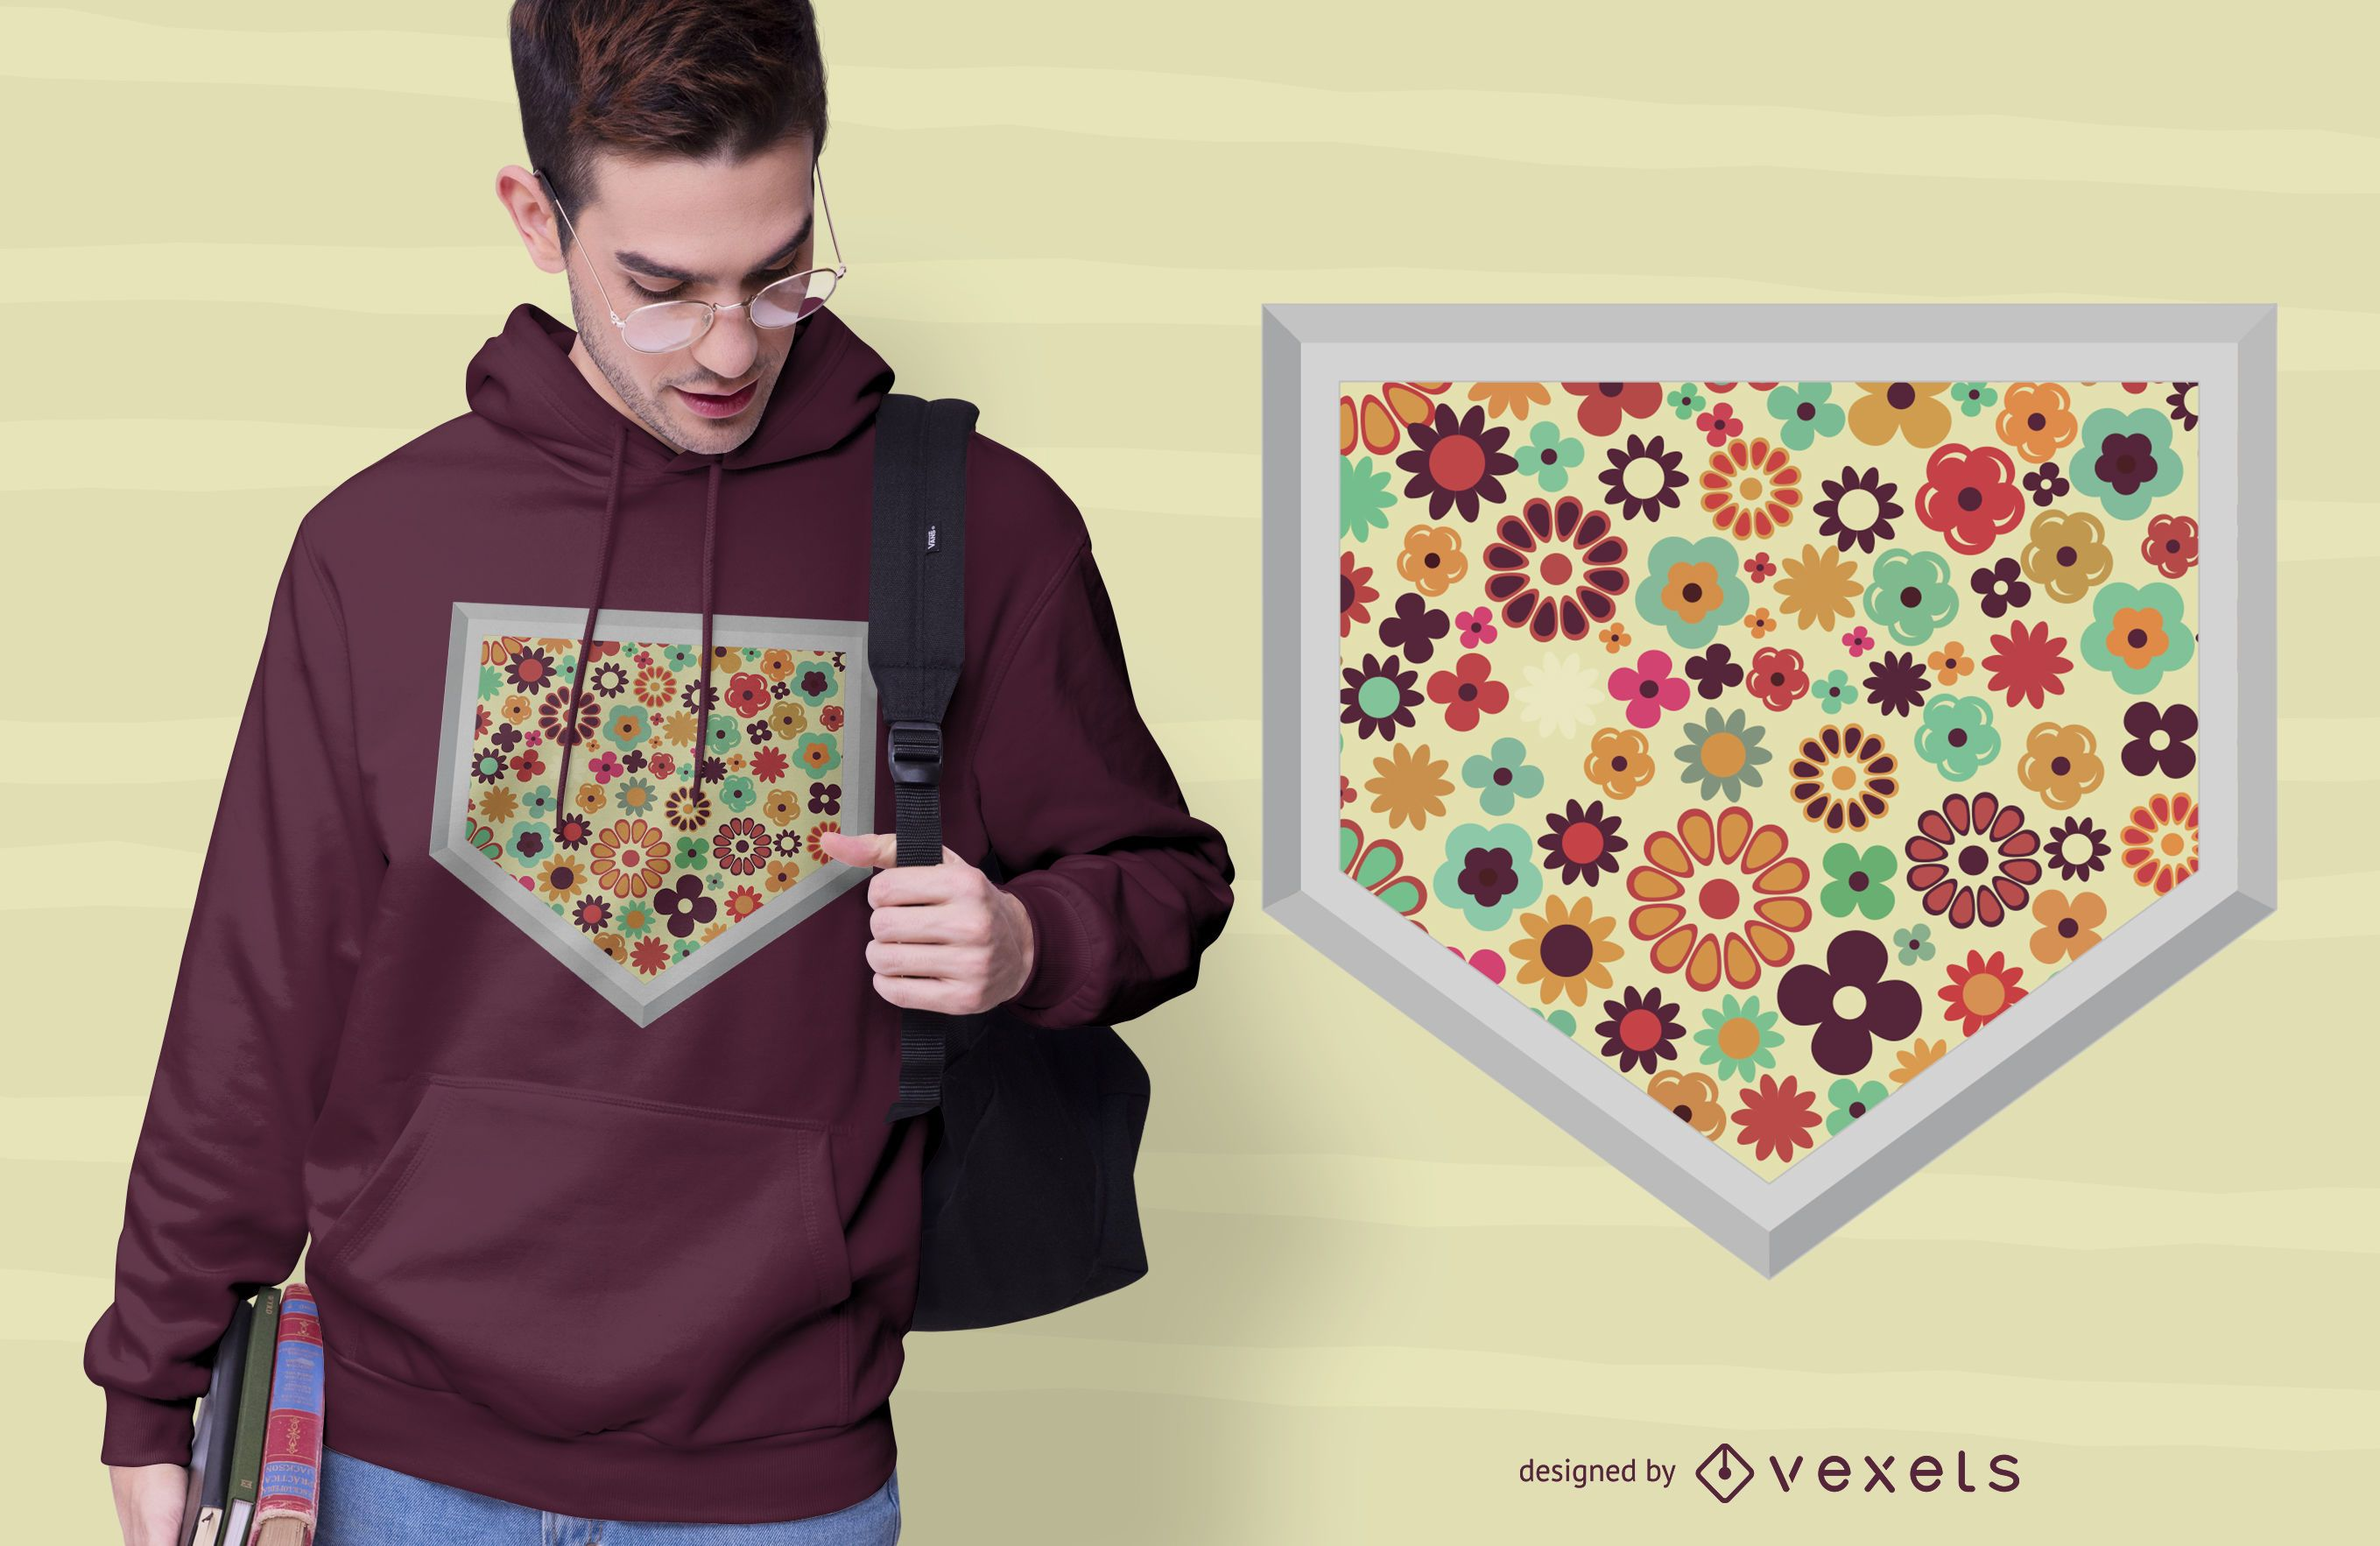 Flower Baseball Home Plate T-shirt Design